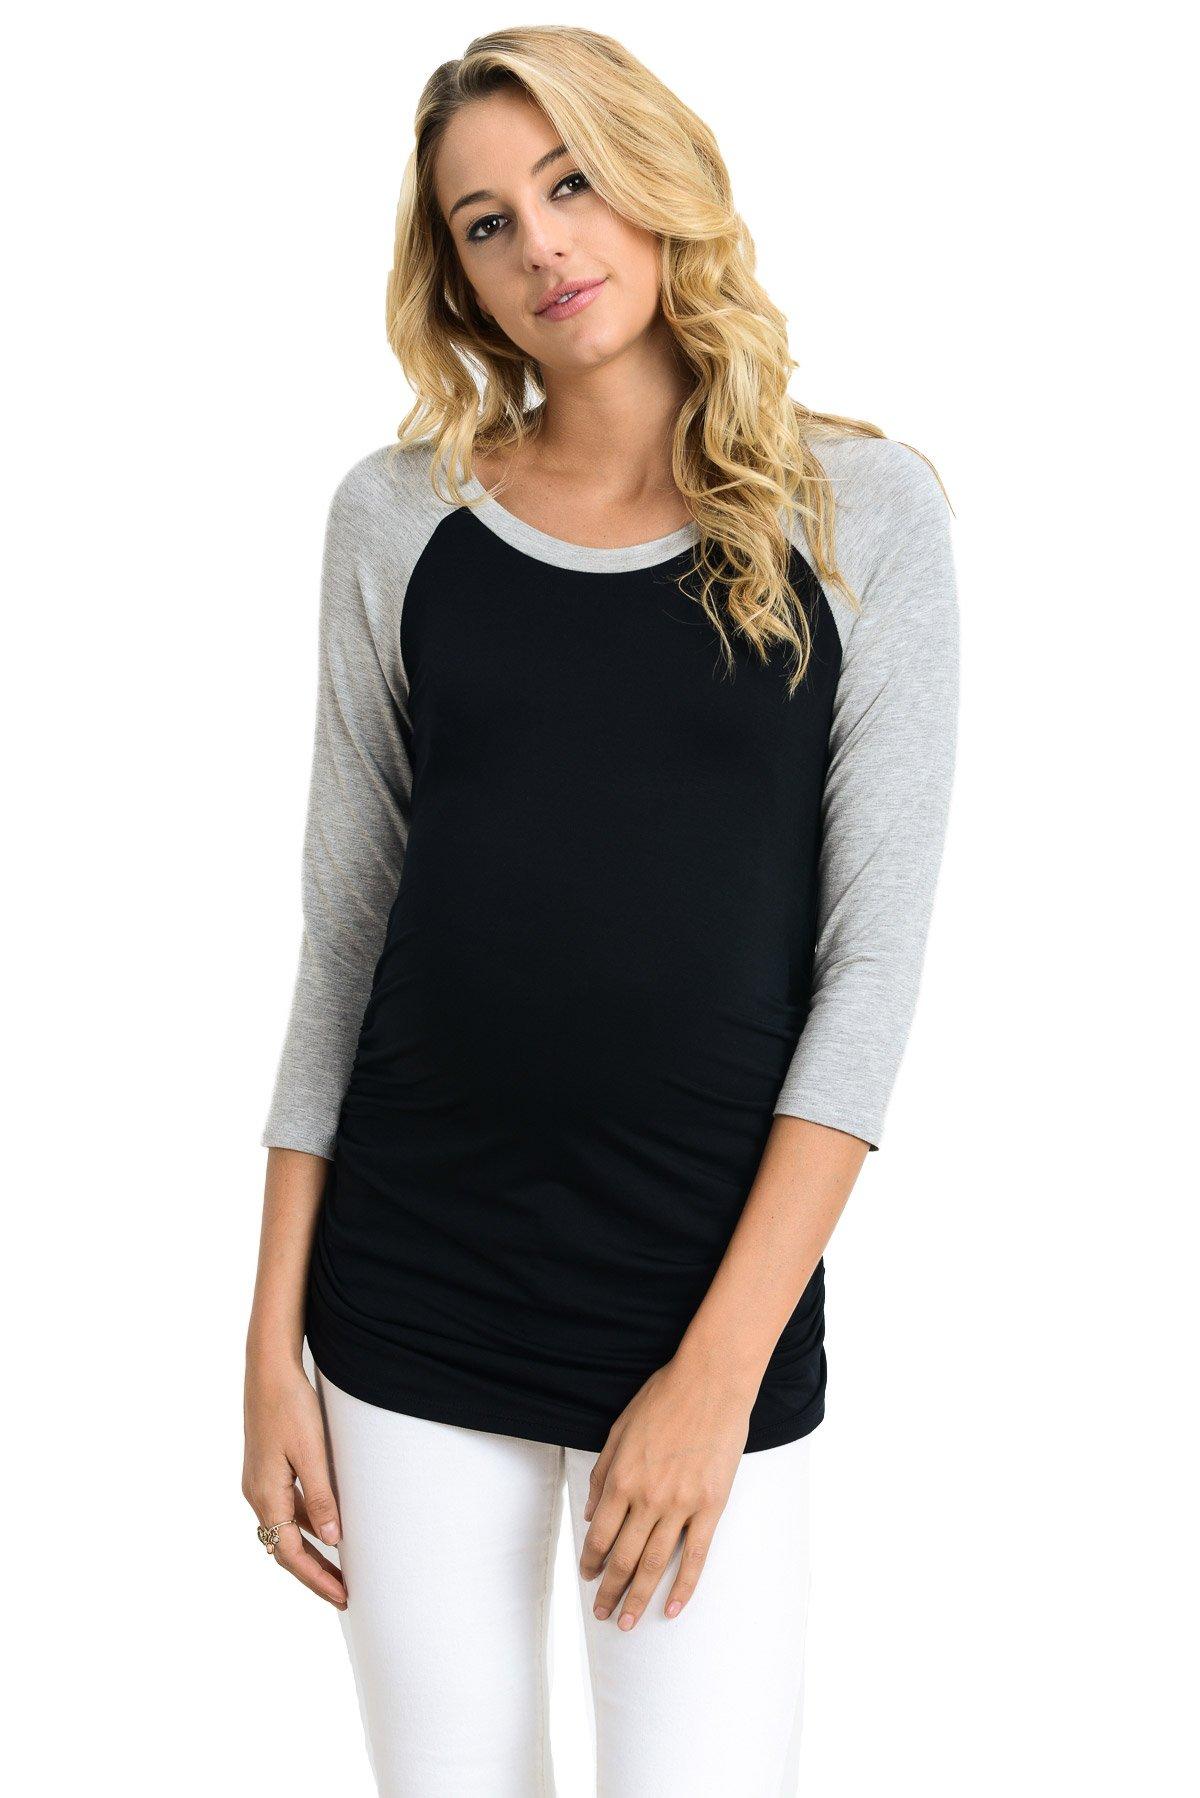 LaClef Women's Maternity T-Shirts Top with Baseball Raglan